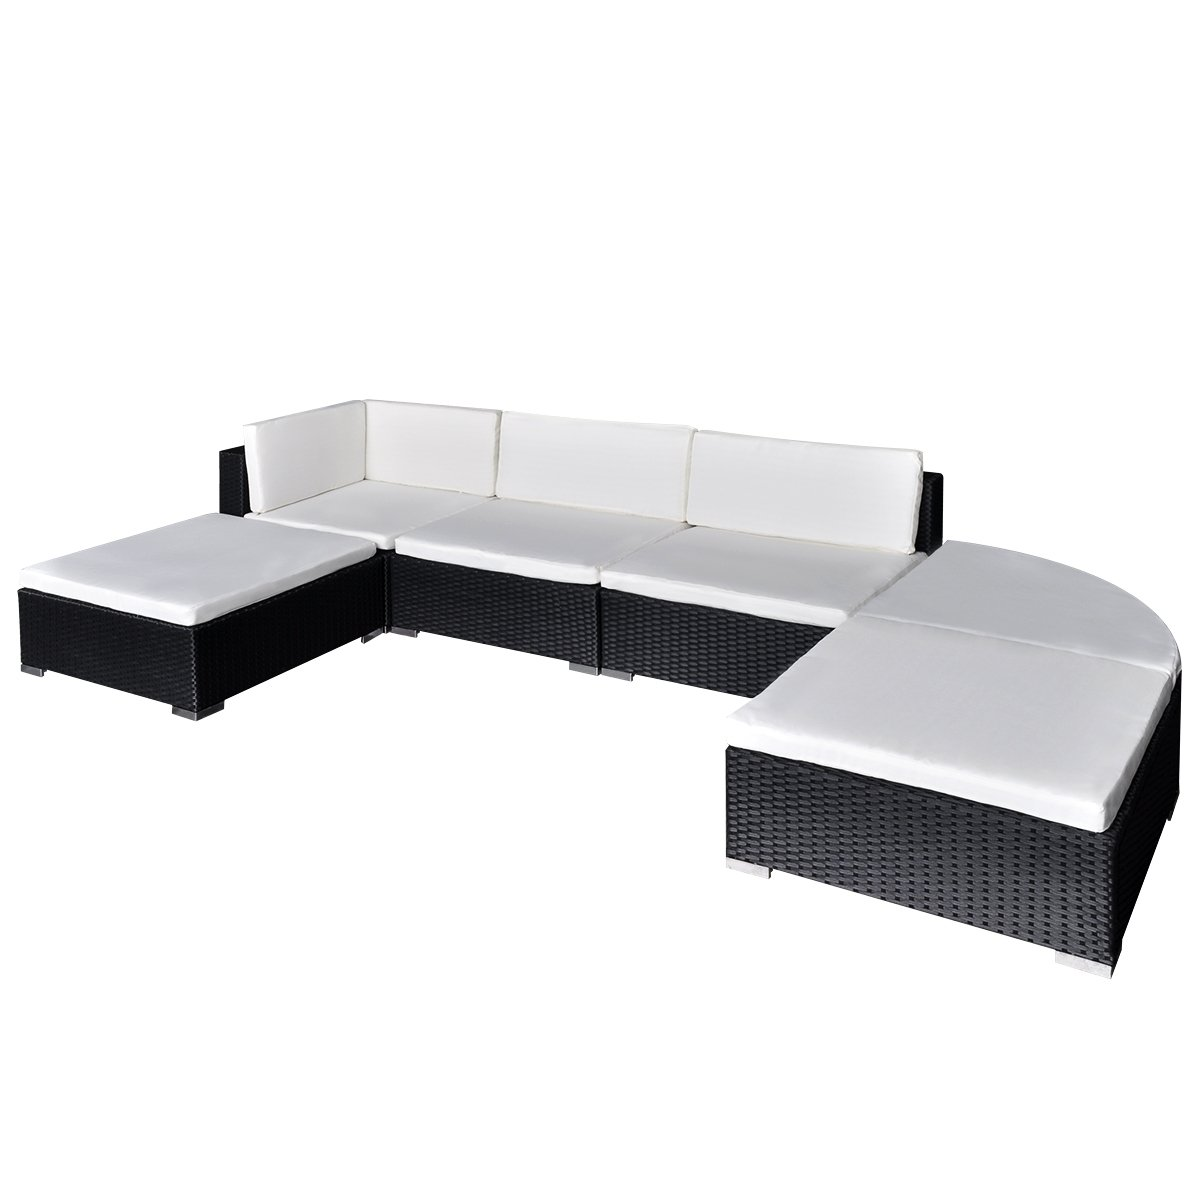 vidaXL Gartenmöbel Poly Rattan Set Lounge Sitzgruppe Schwarz 16-teilig